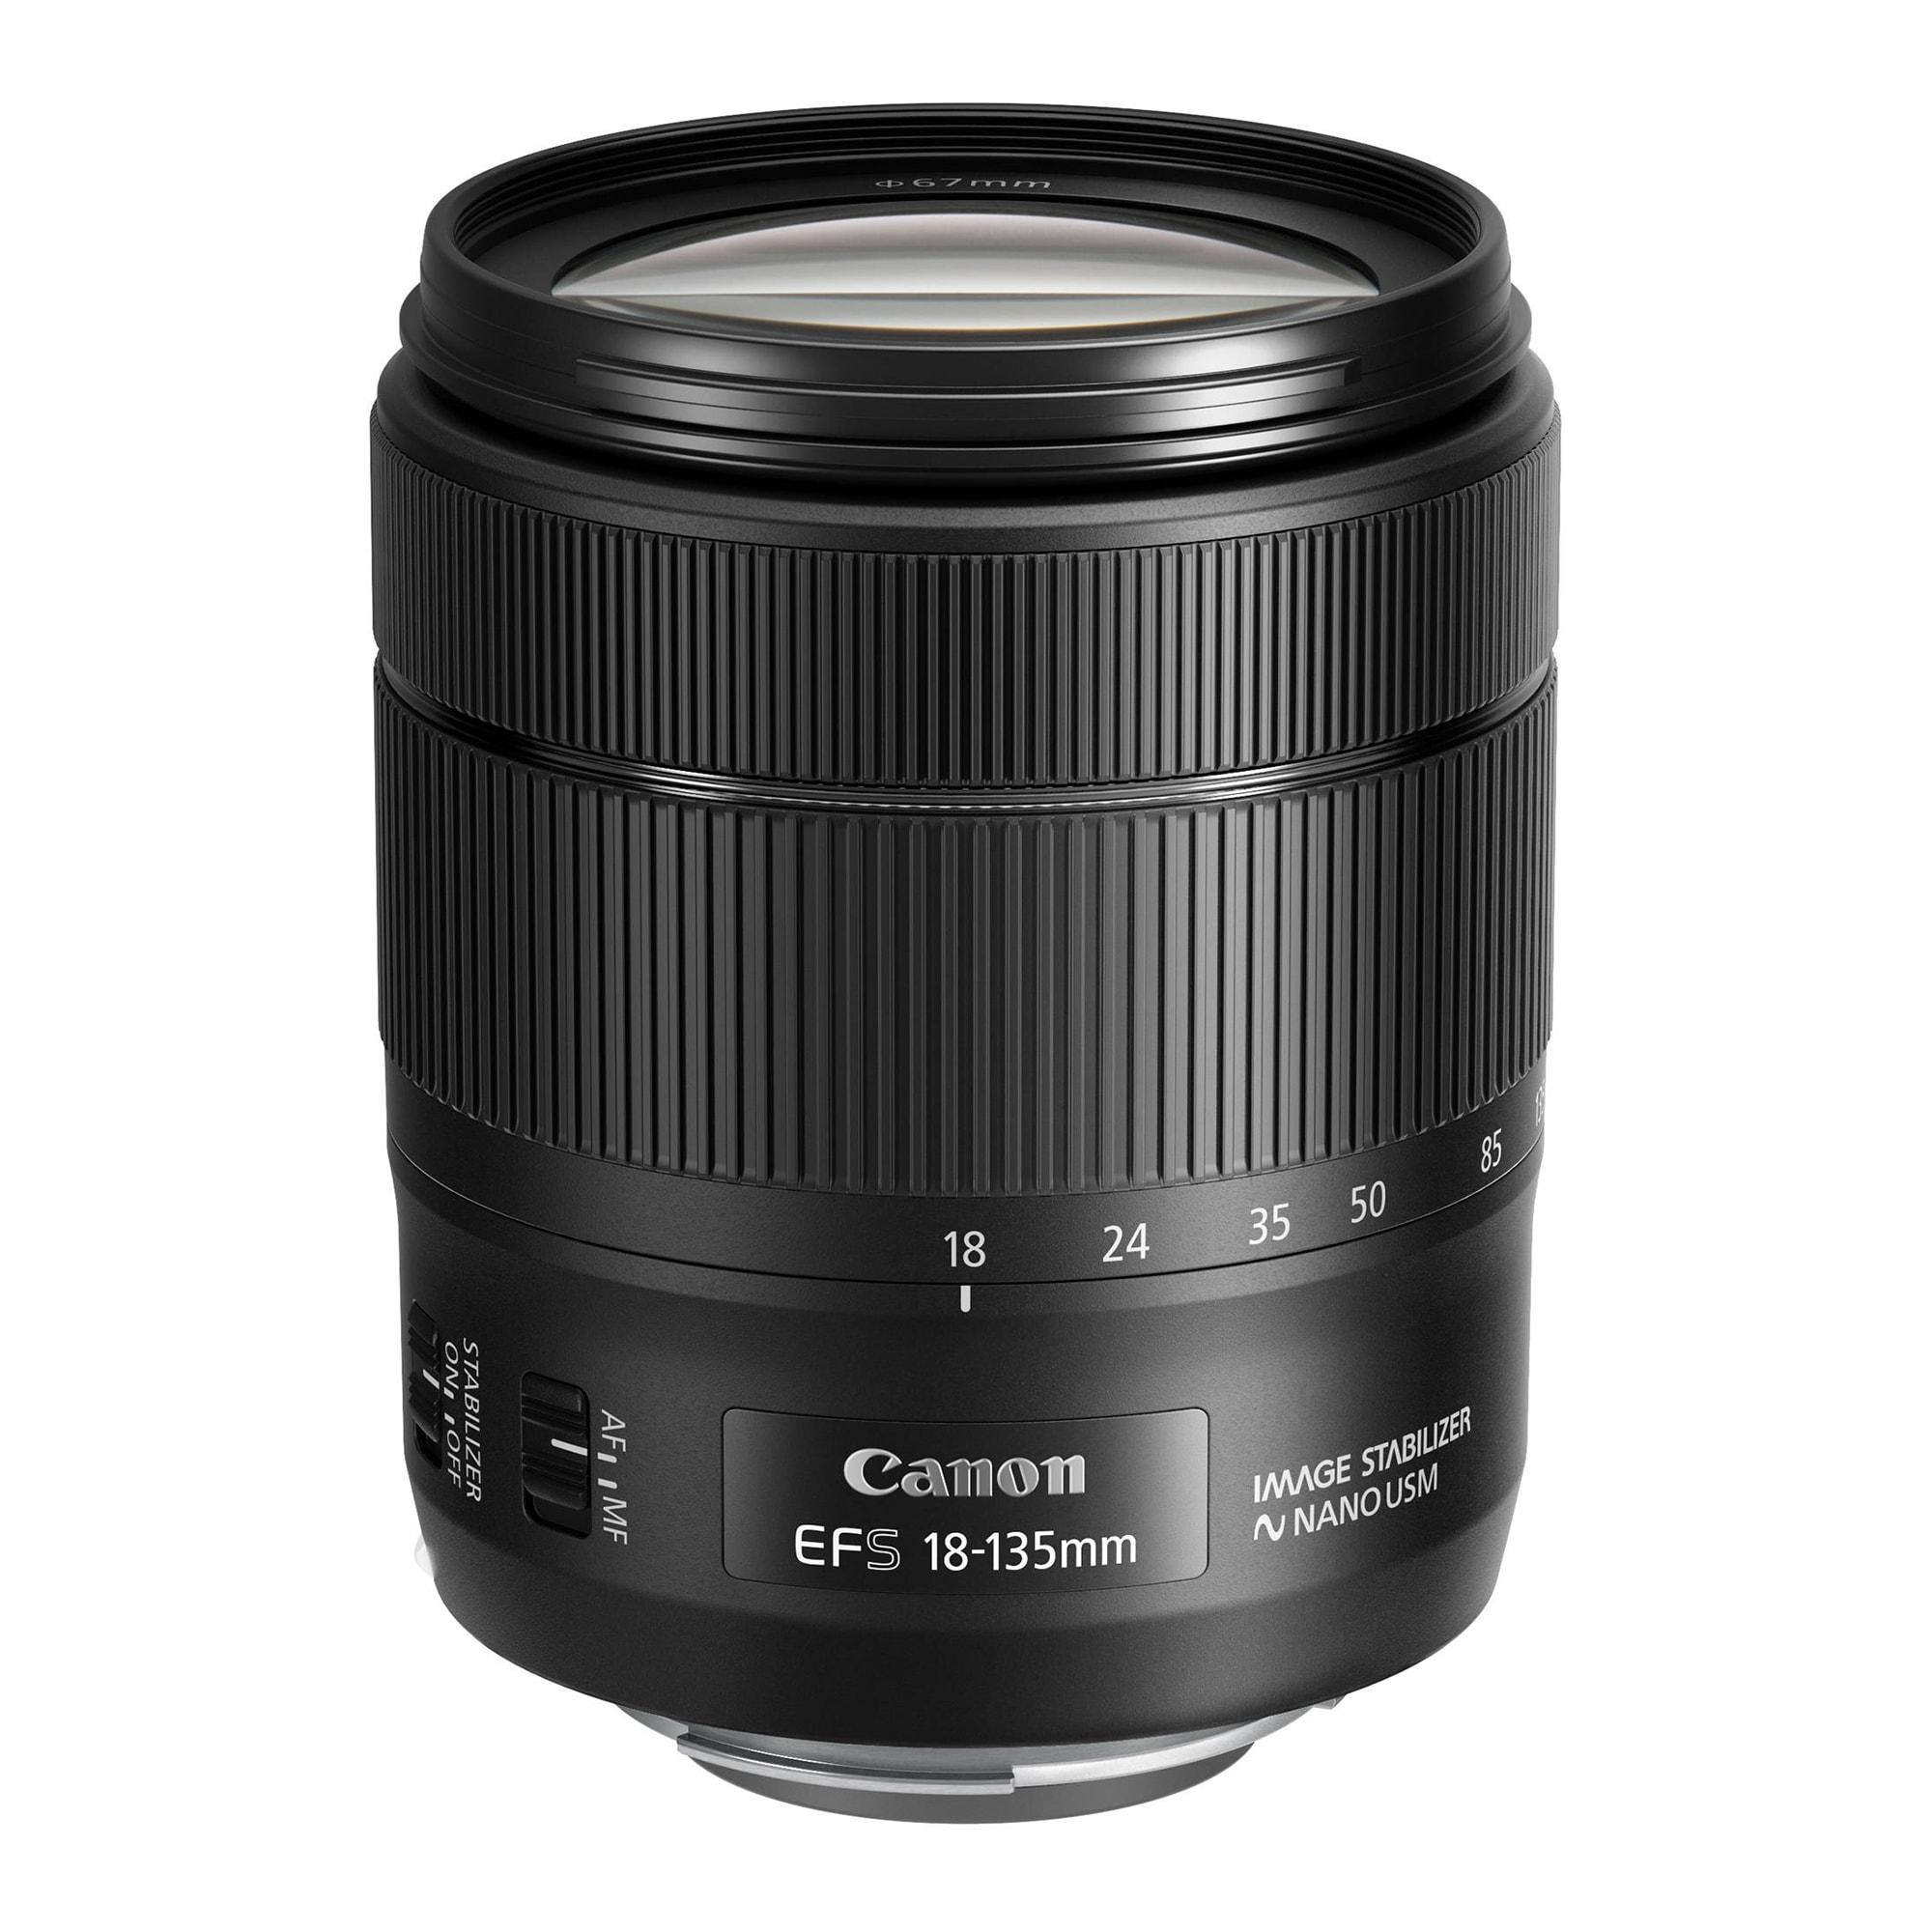 Canon EF-S USM 18-135mm f/3,5-5,6 - DEMO EX